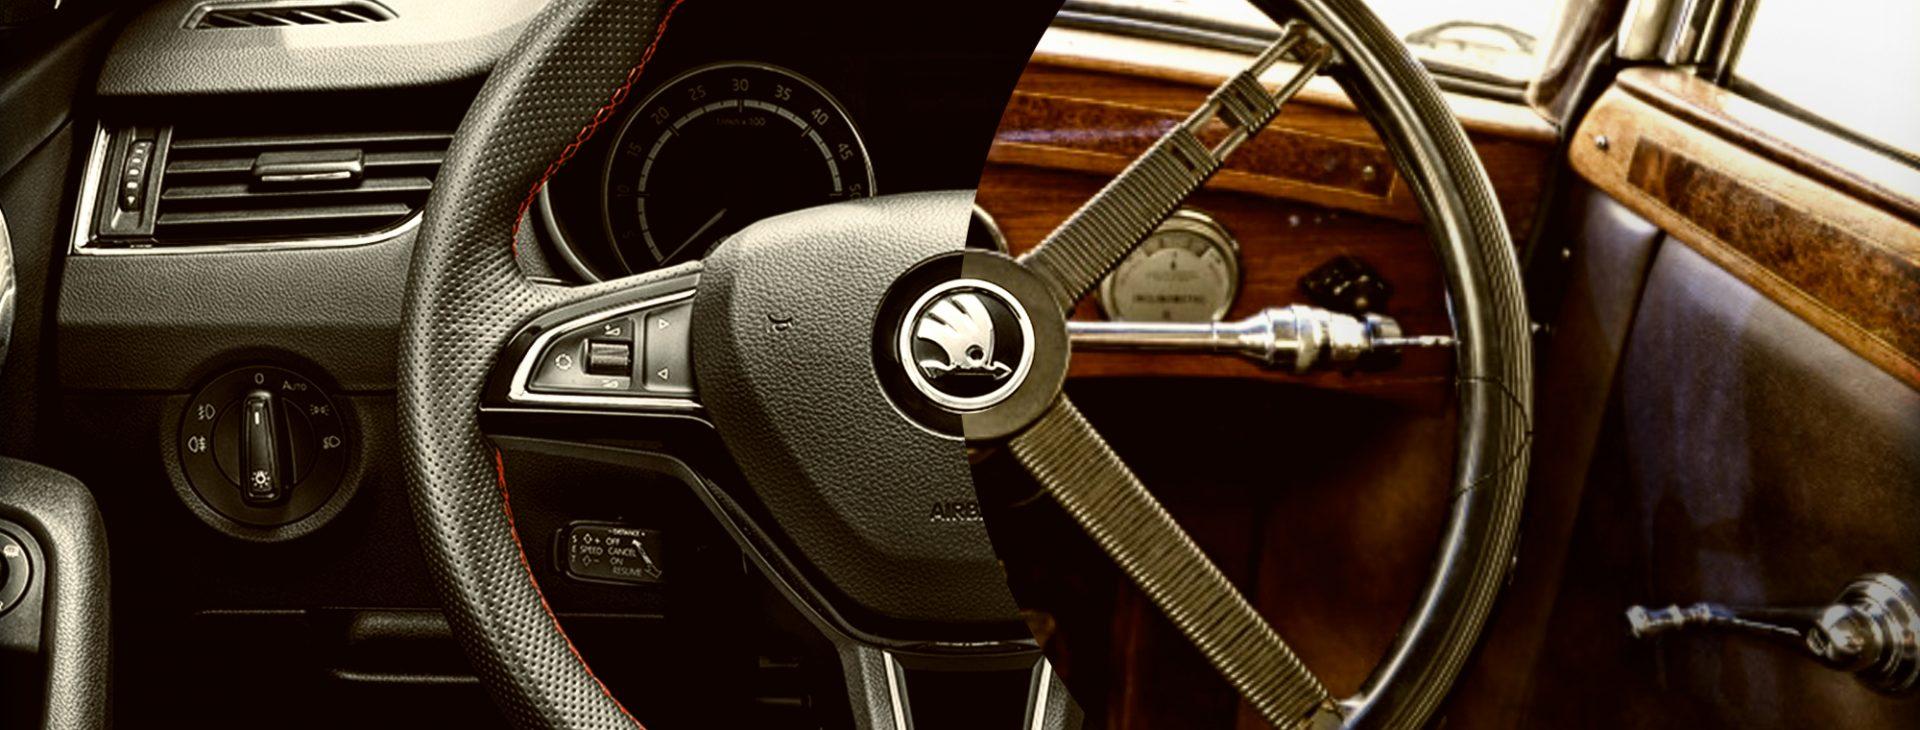 Poziția mâinilor pe volan